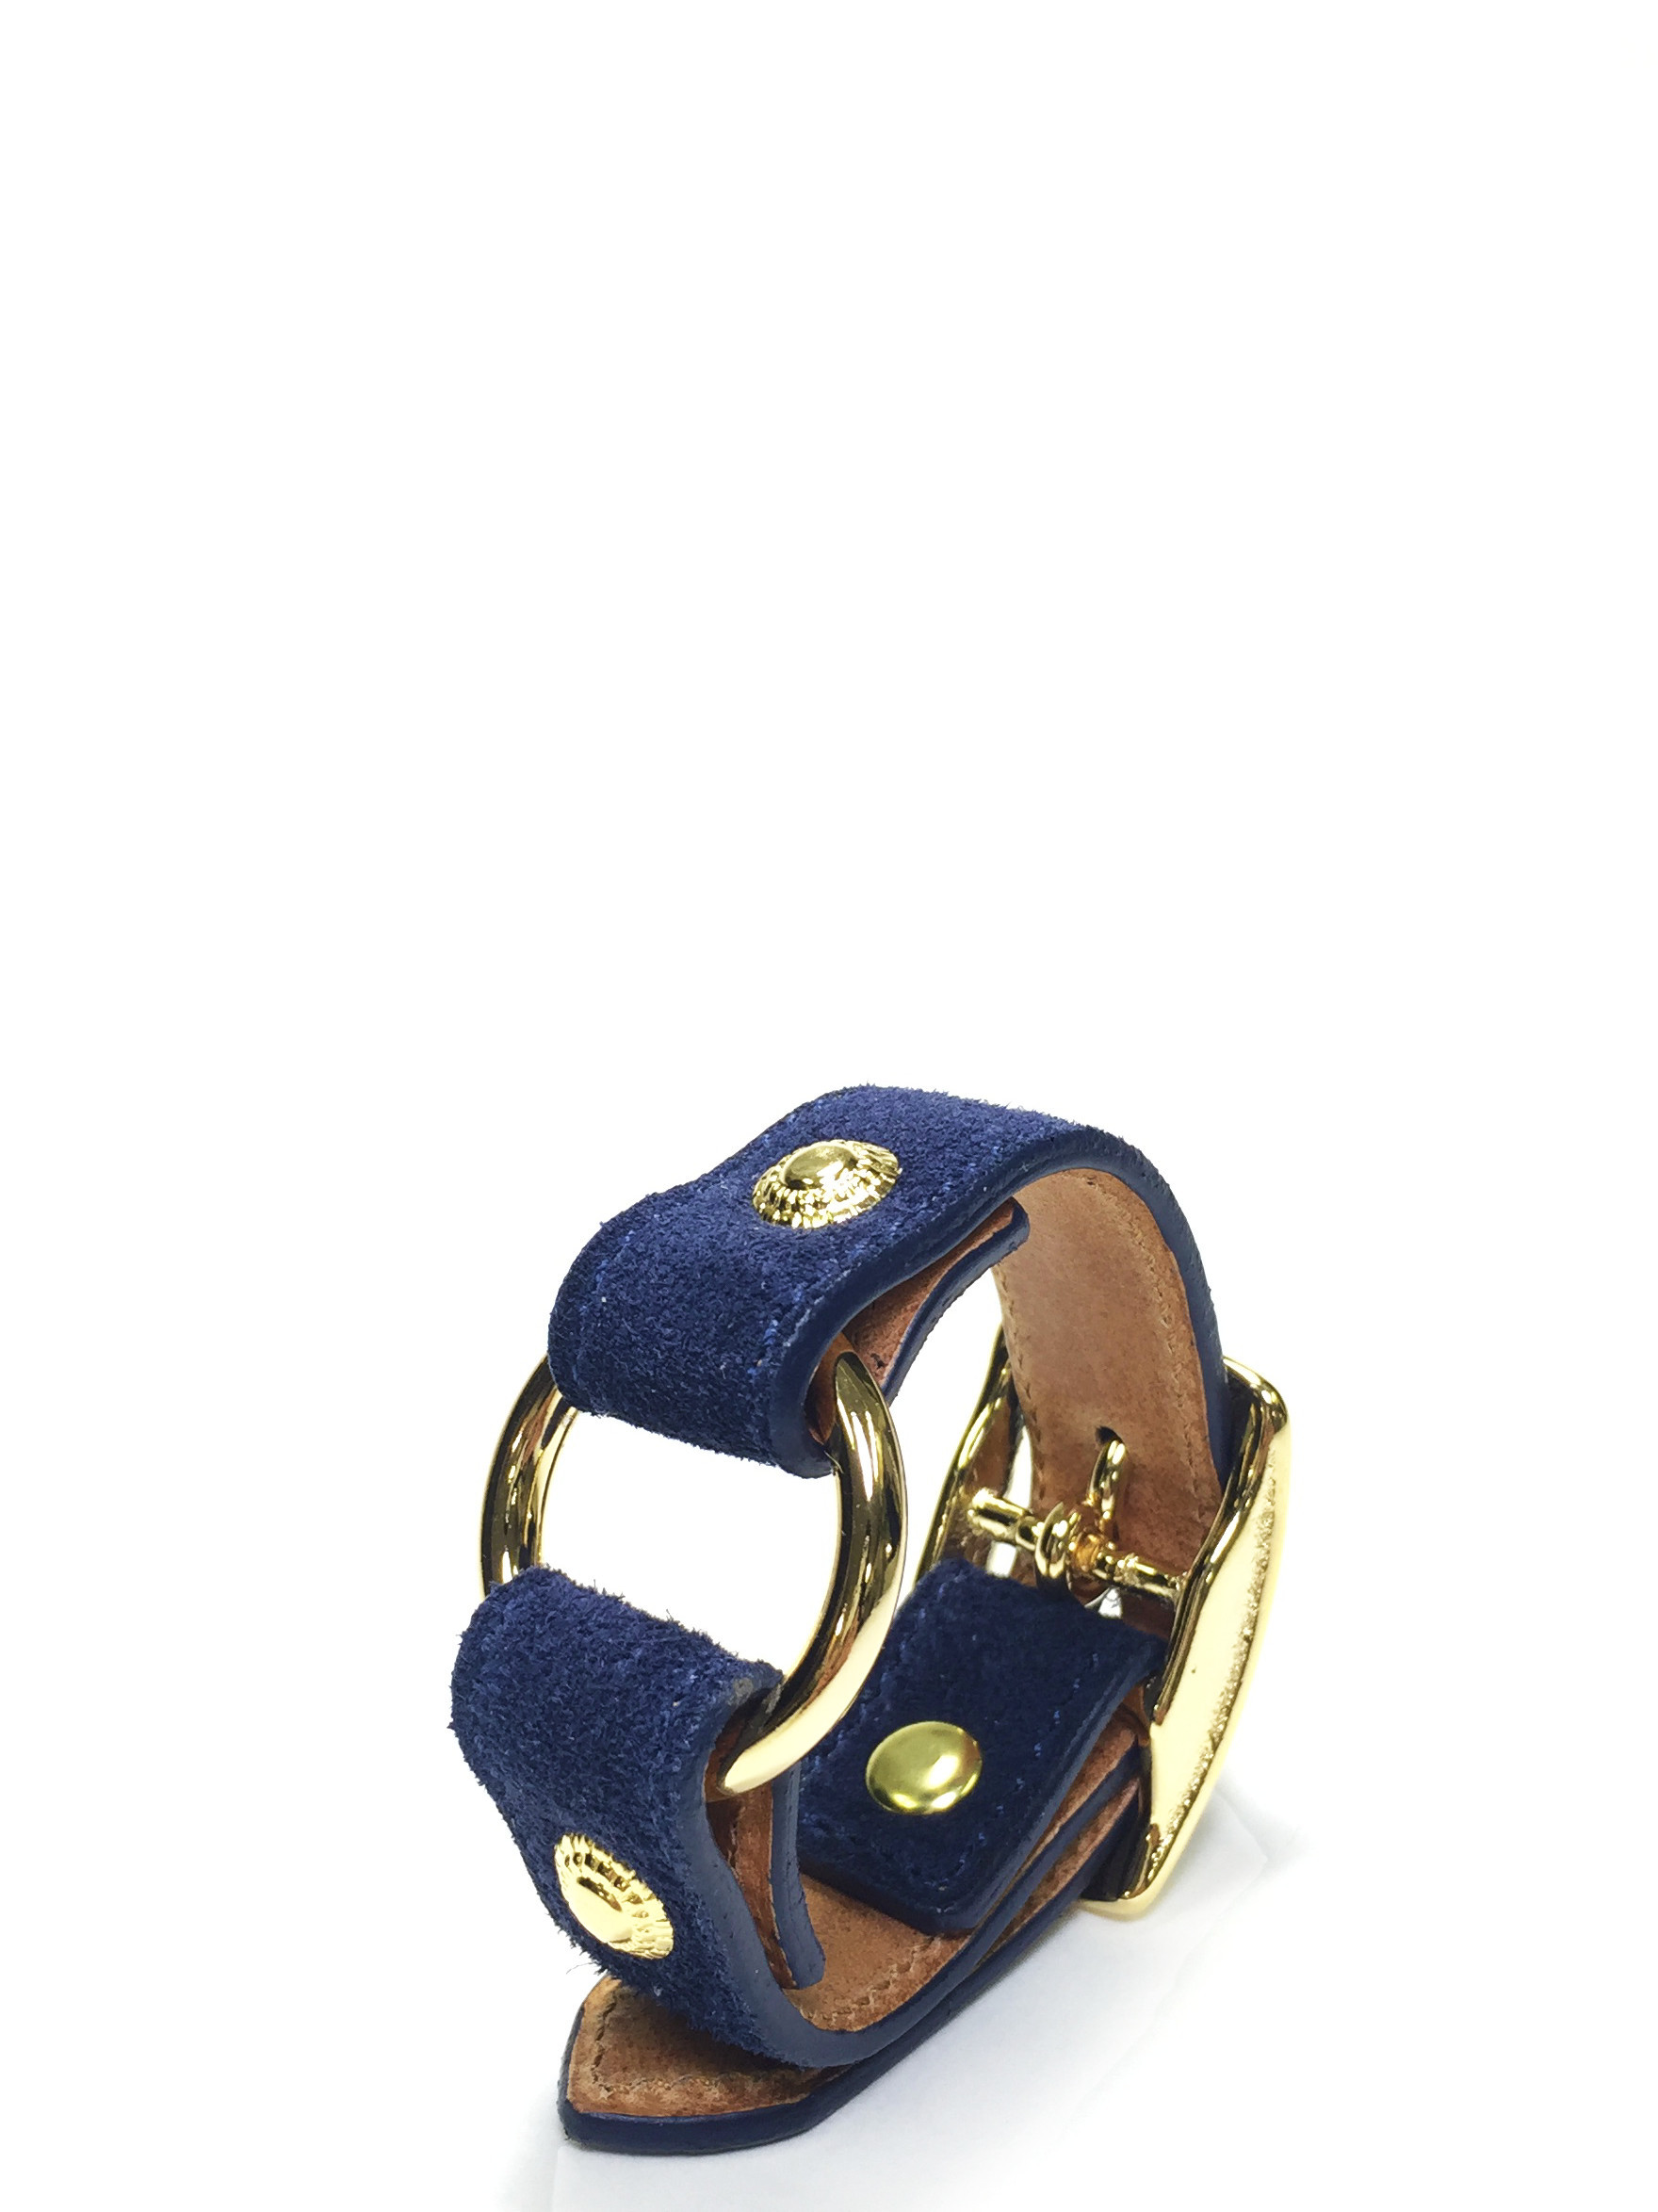 nahezugleich / Suede Ring bracelet - 画像3